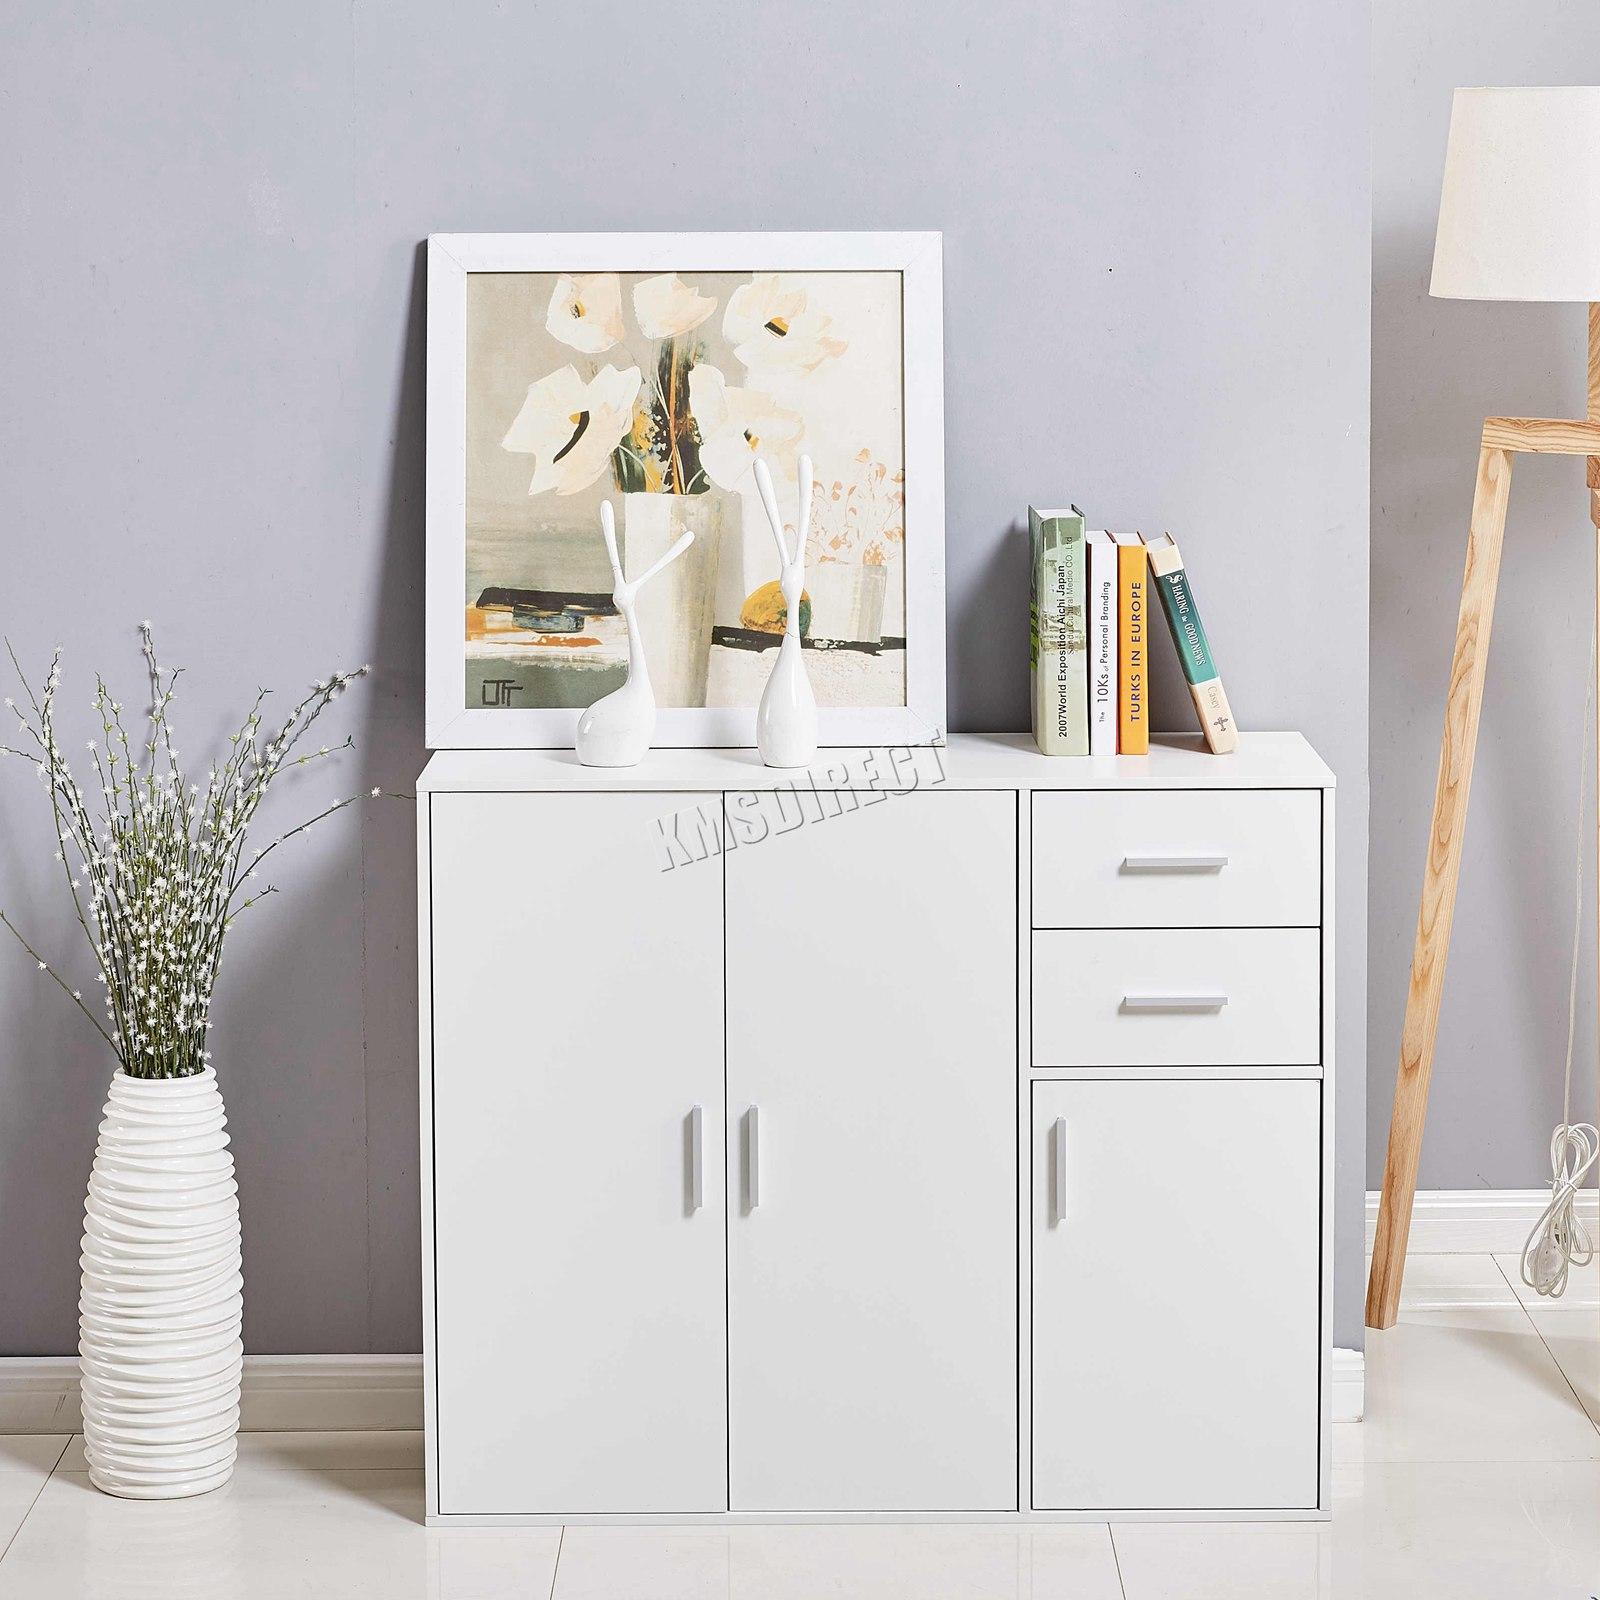 WestWood-Sideboard-Cabinet-Storage-tableware-Kitchen-Cupboard-Unit-PB-SSP01-NEW thumbnail 36